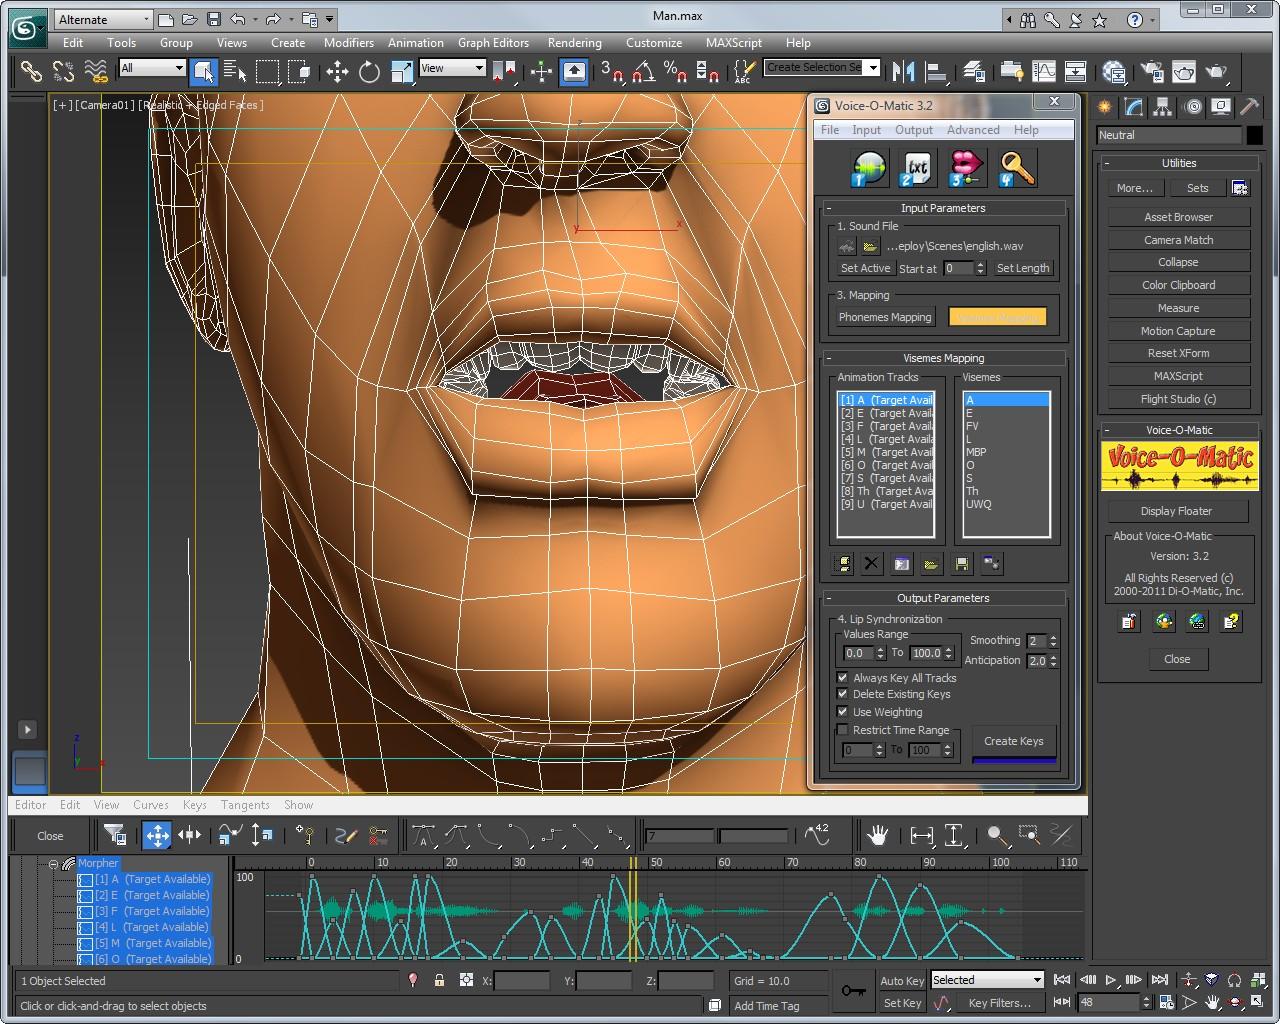 autodesk maya software free download